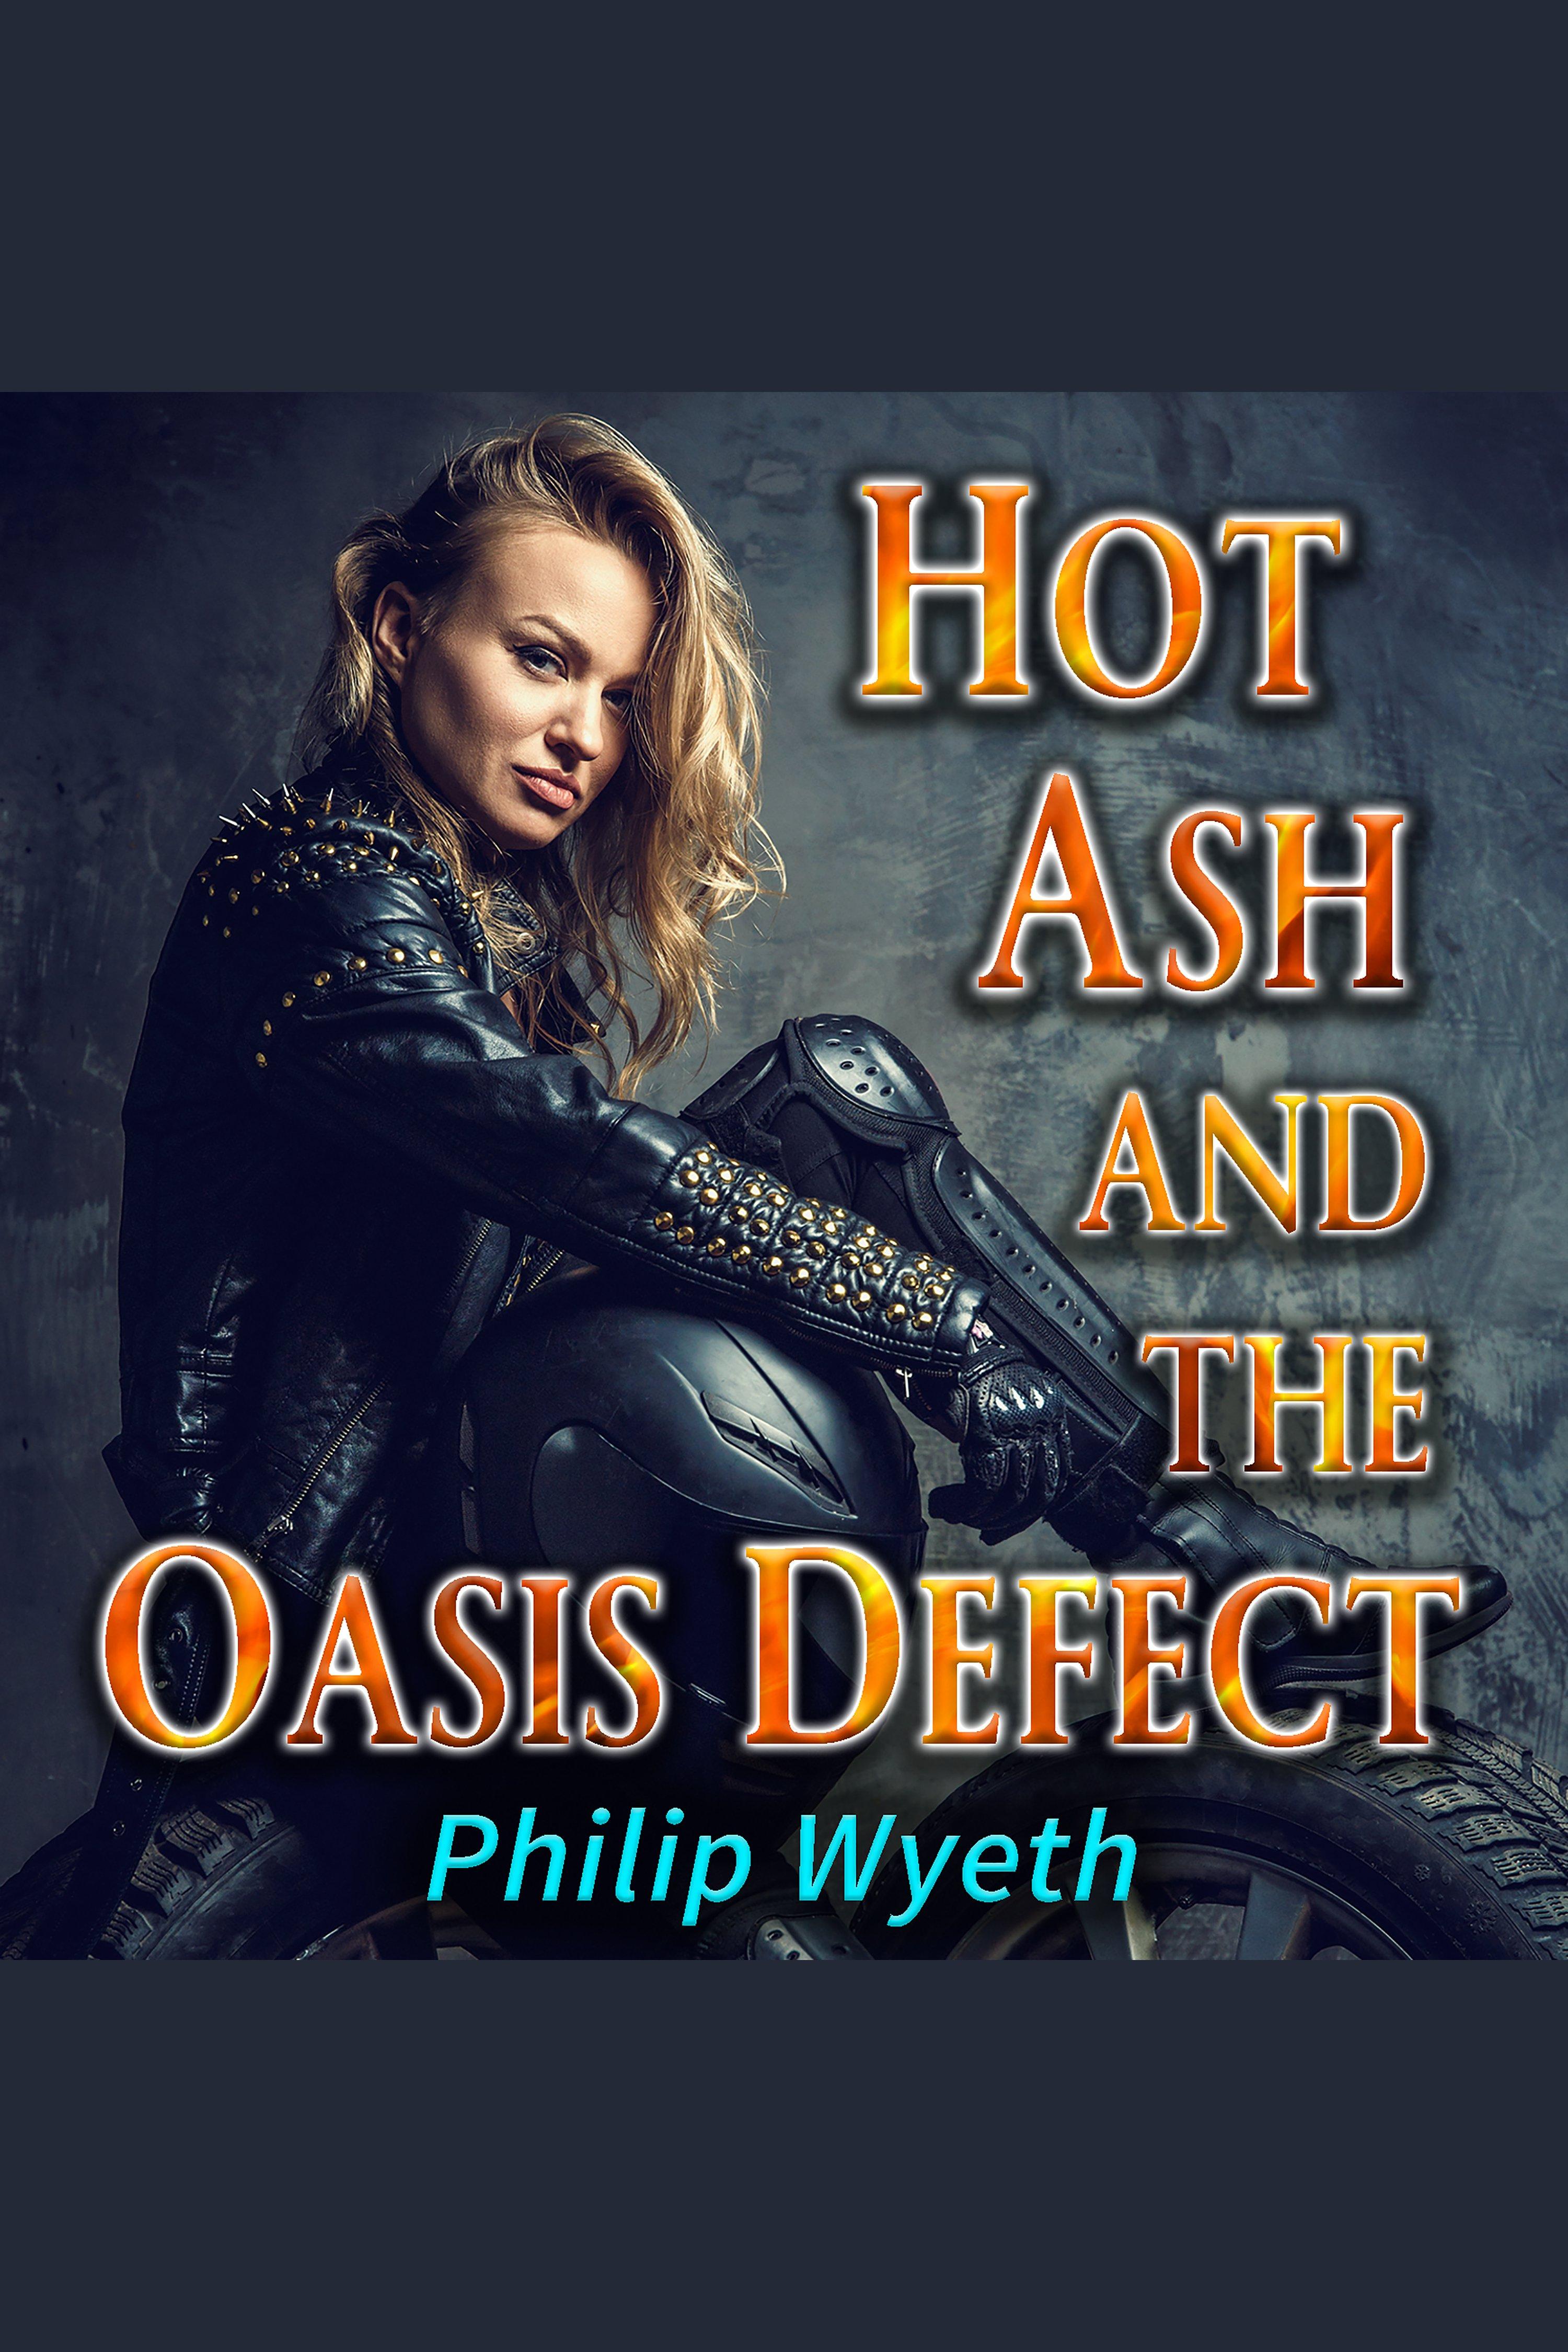 Esta es la portada del audiolibro Hot Ash and the Oasis Defect